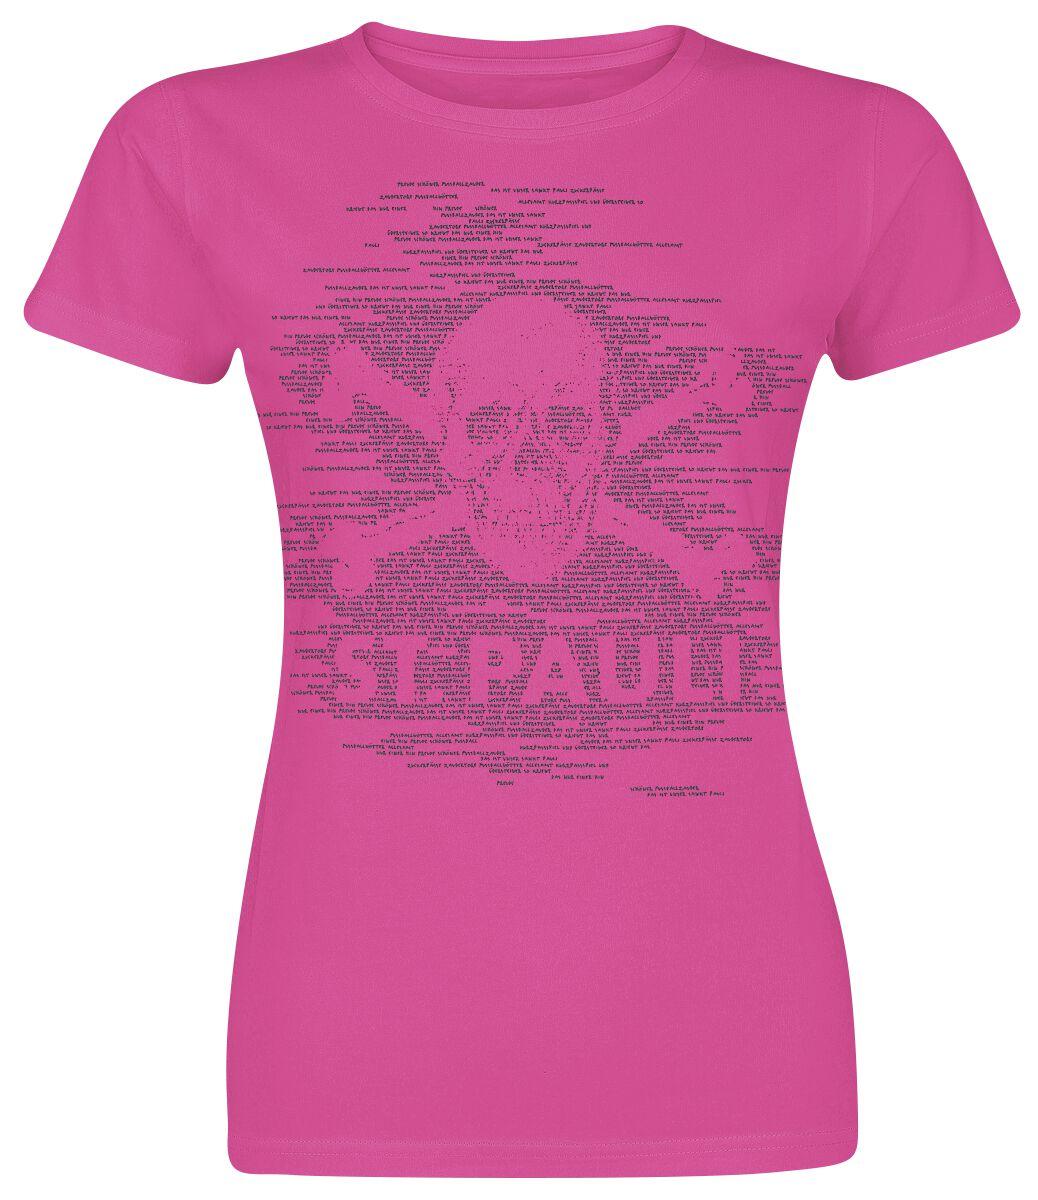 FC St. Pauli TK Freude Koszulka damska różowy